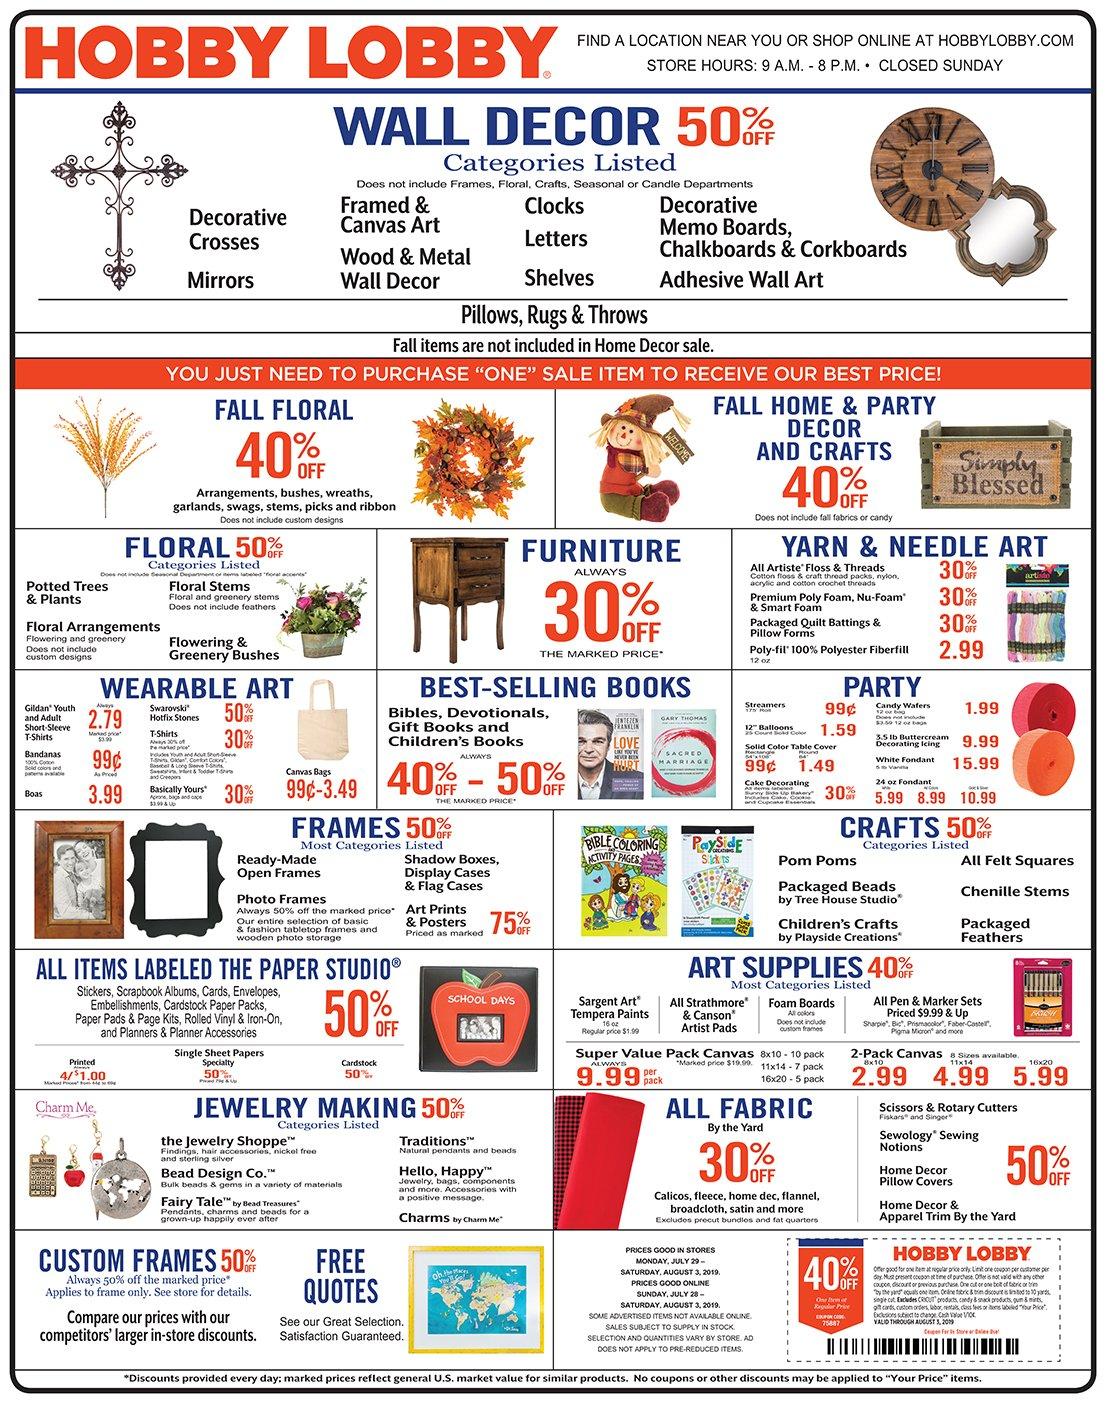 Weekly Ad & Coupon Calendar 2019 Hobby Lobby